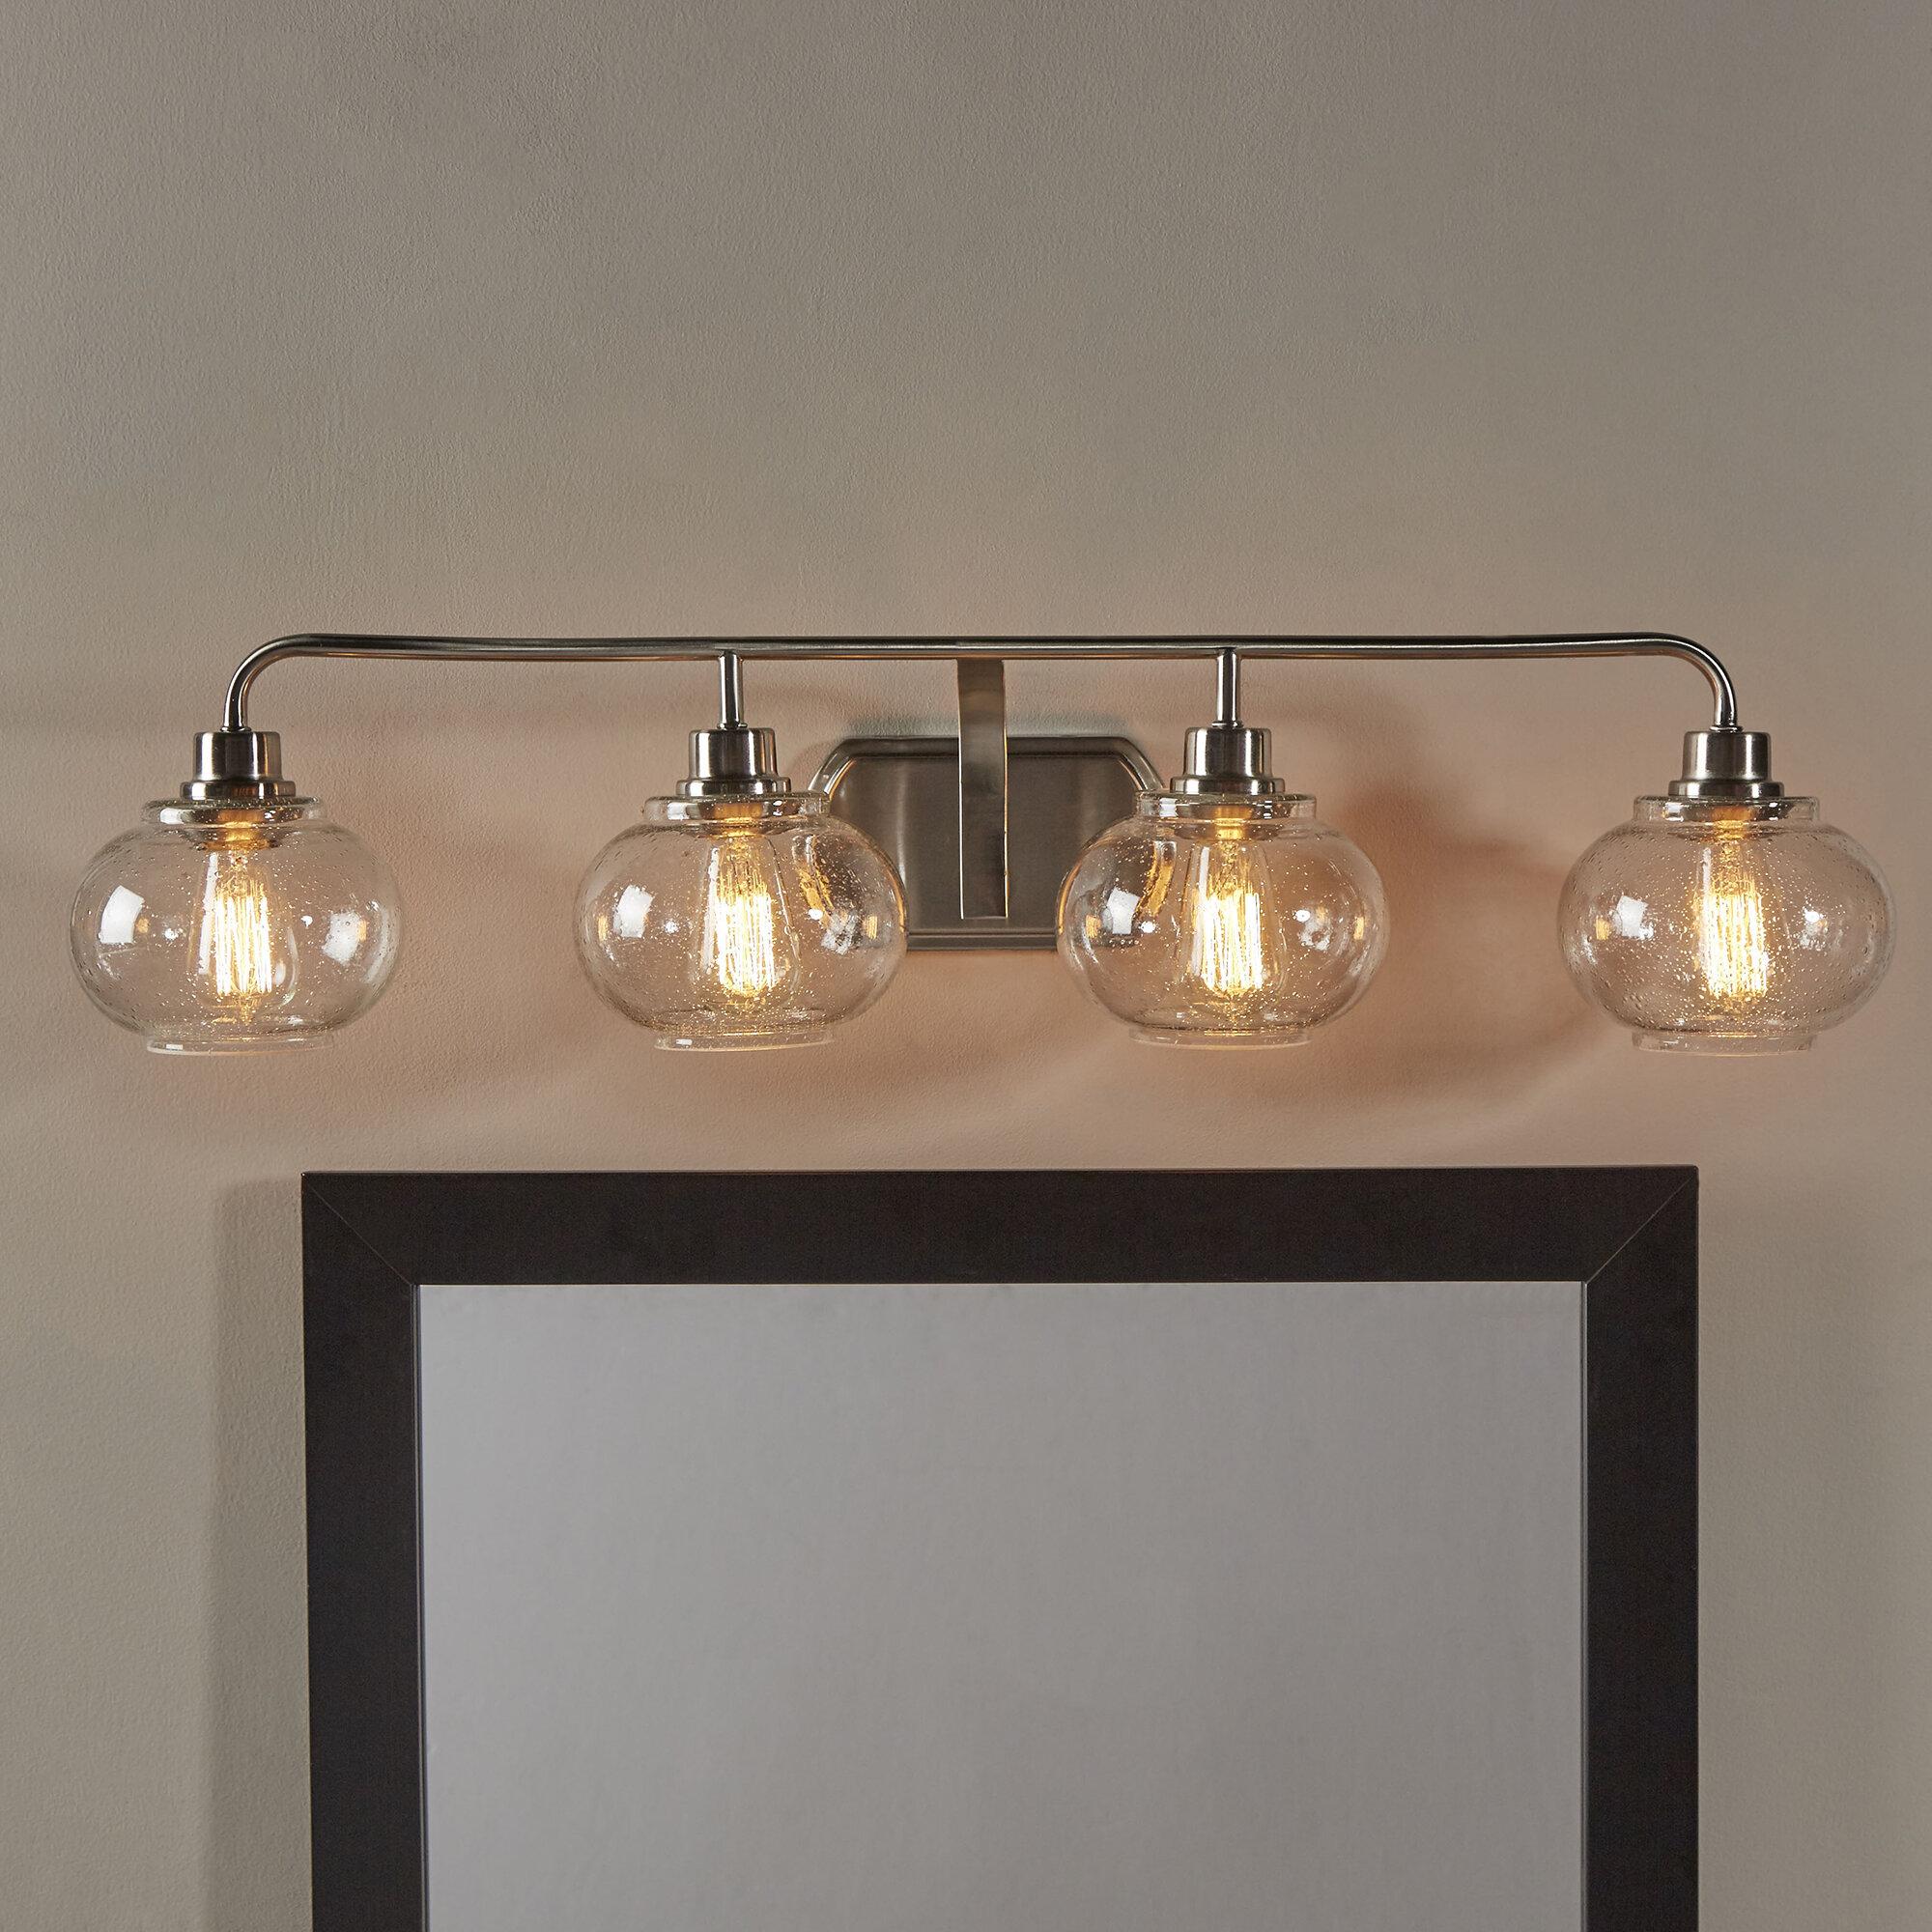 Lavalle 4 Light Vanity